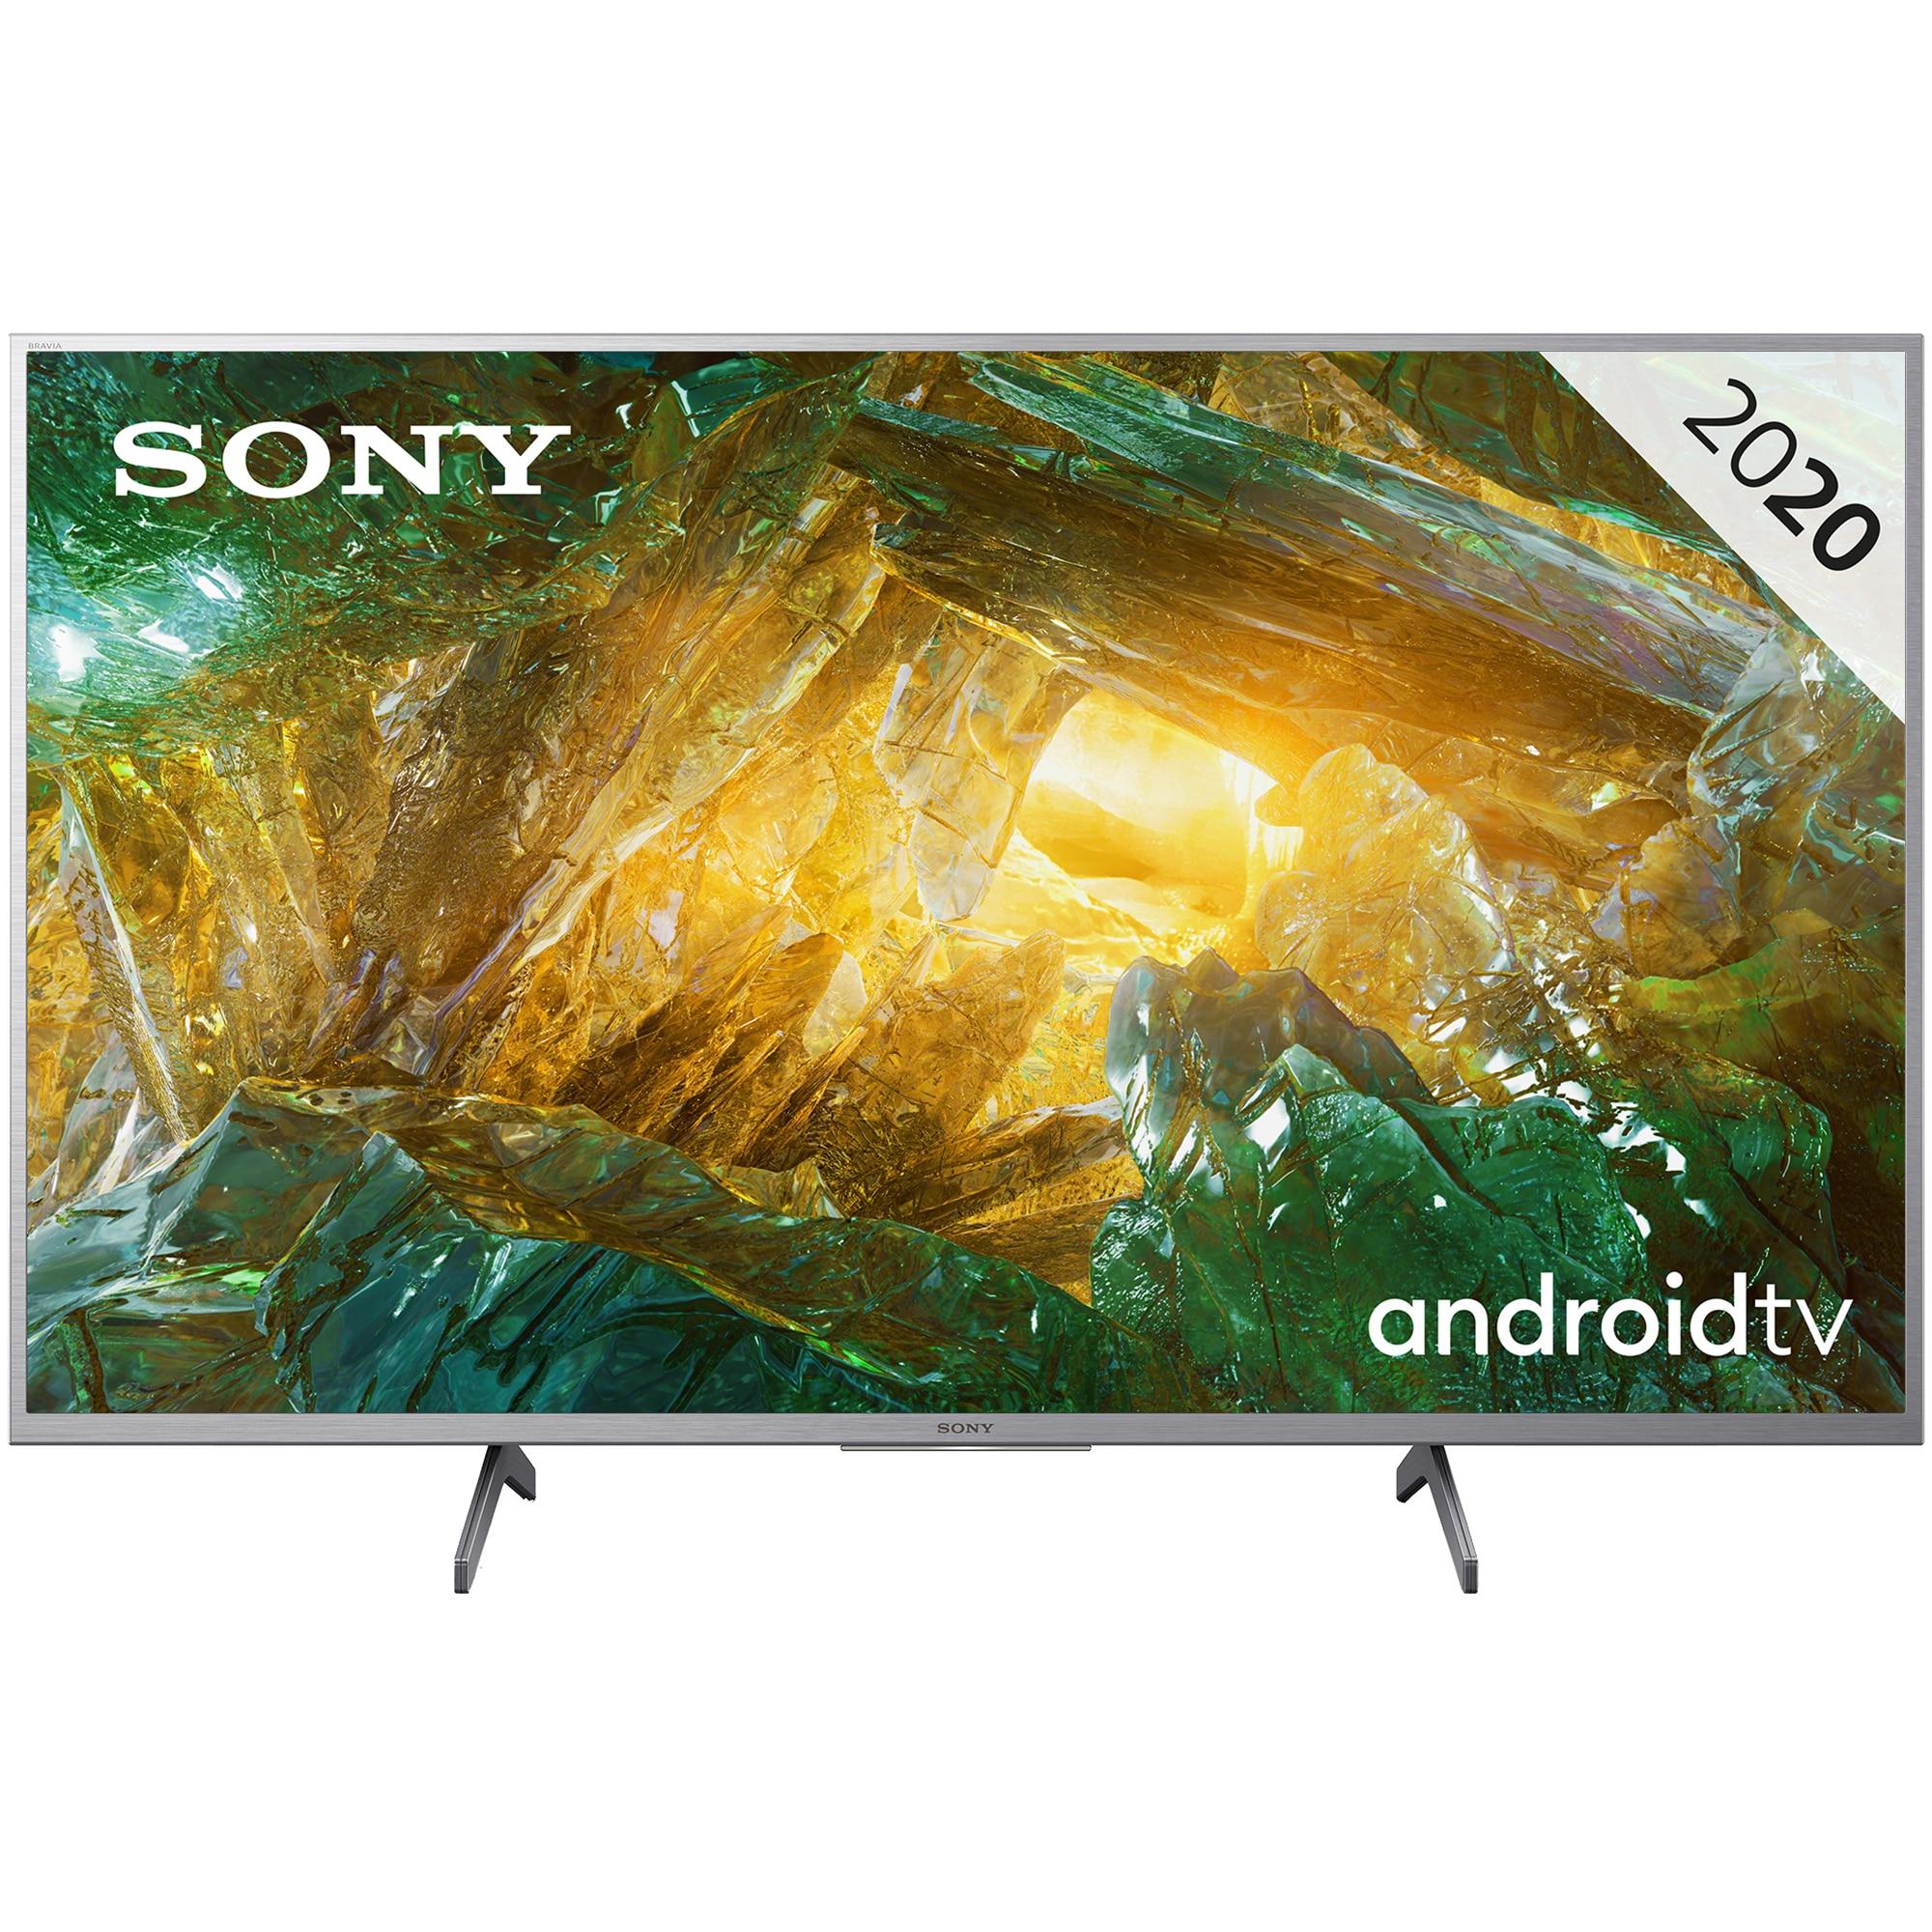 Fotografie Televizor Sony 43XH8077, 108 cm, Smart Android, 4K Ultra HD, LED, Clasa A